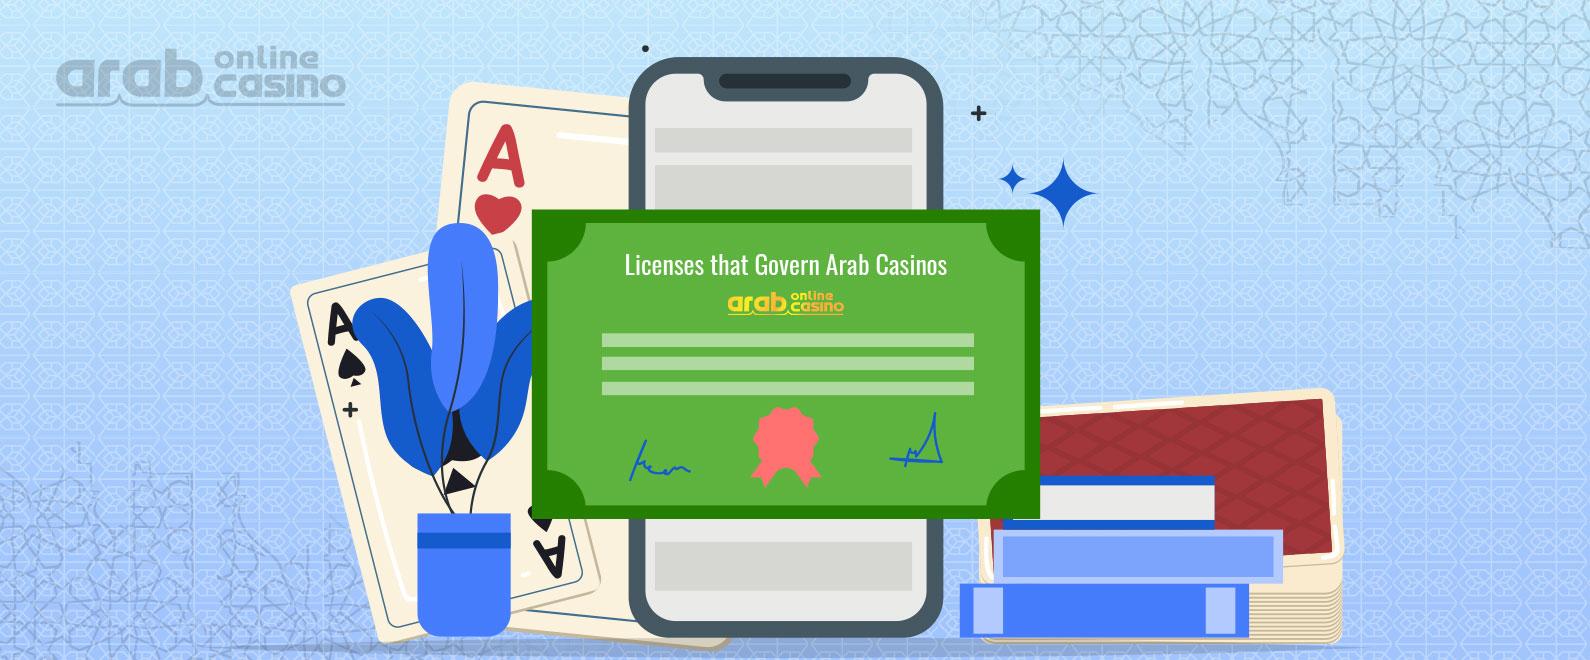 arab casino online license